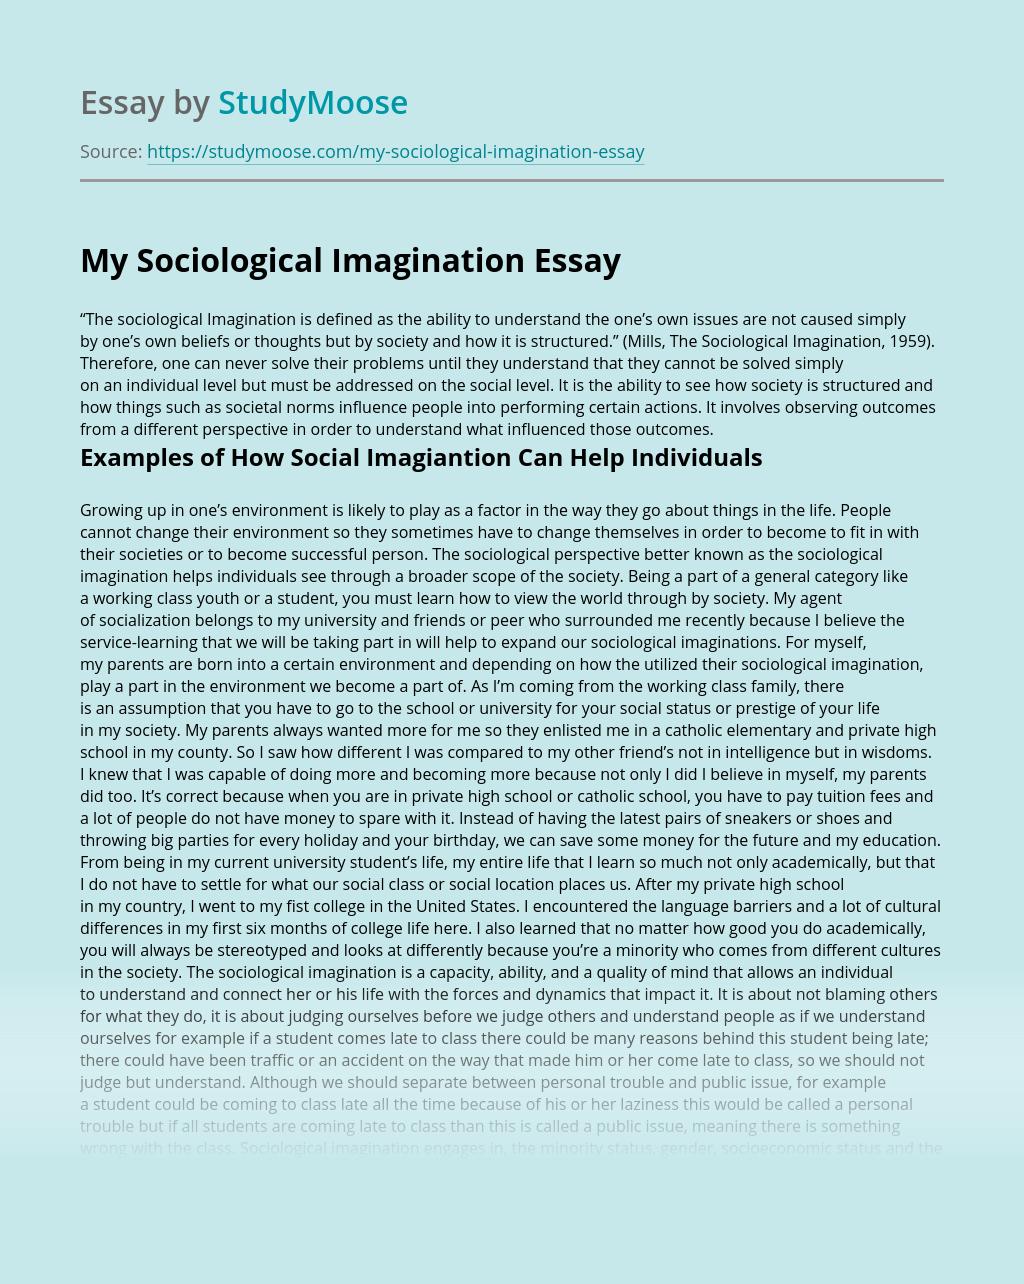 My Sociological Imagination